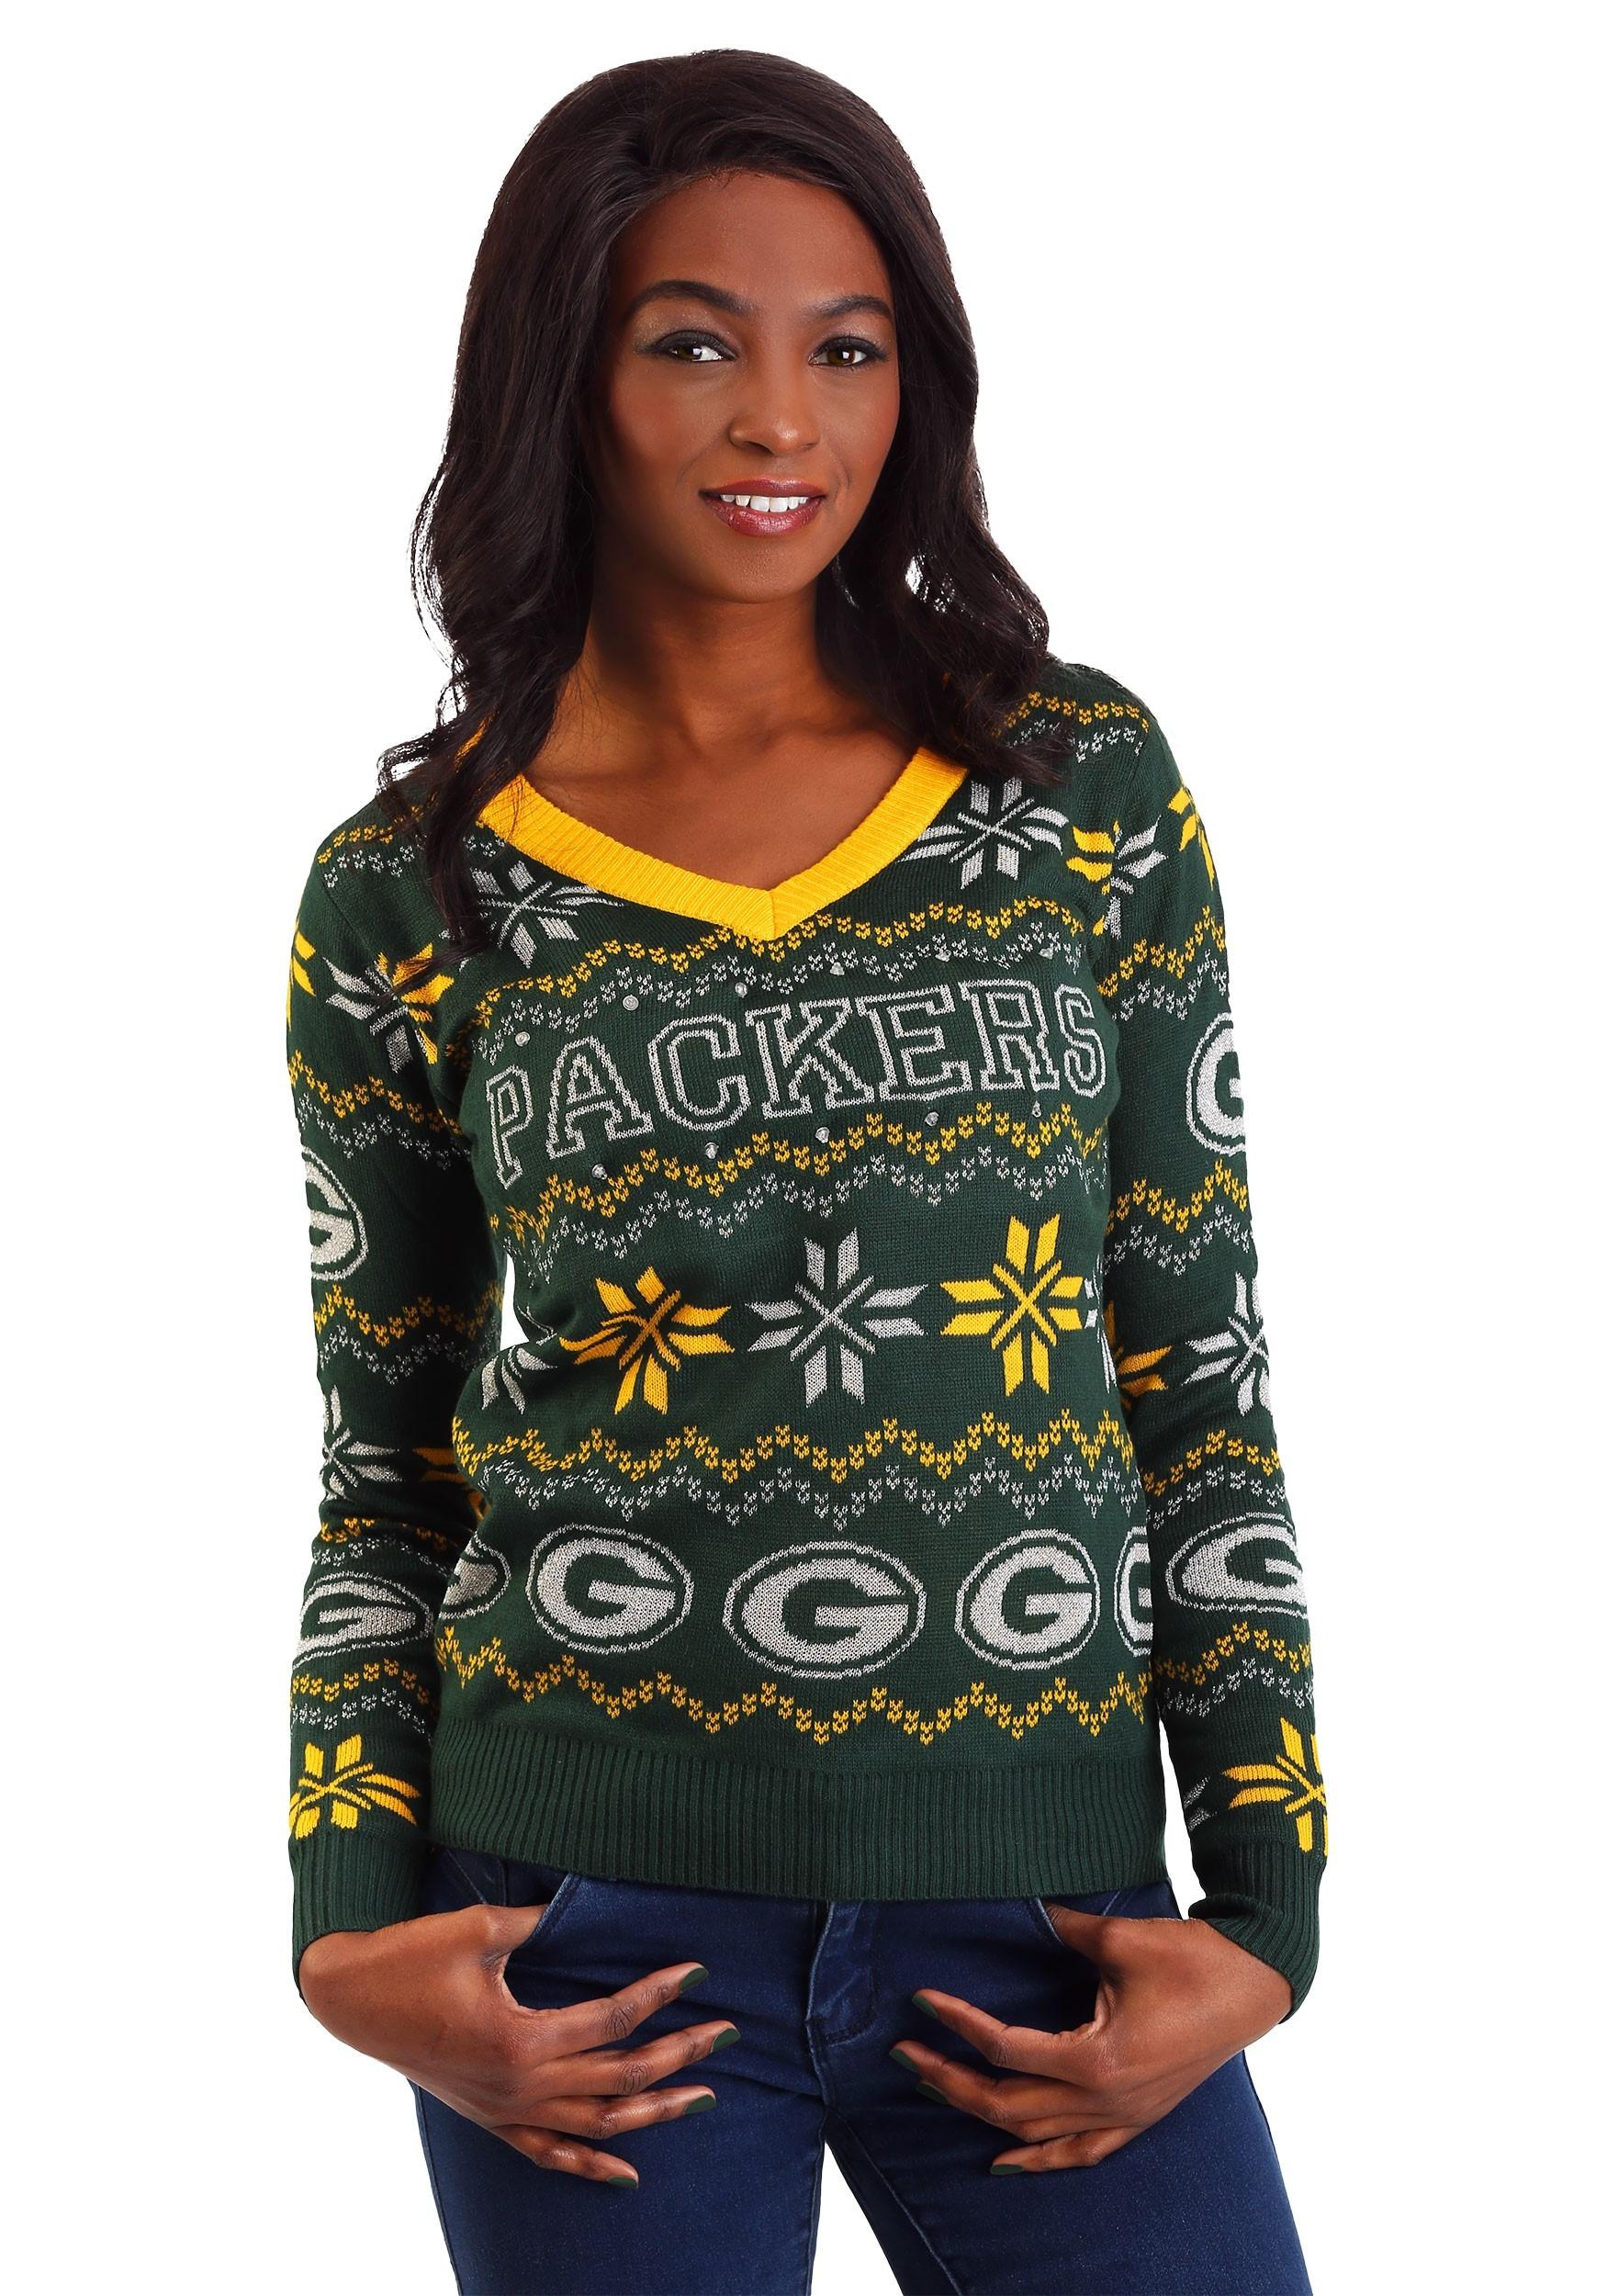 a31f0b84 Green Bay Packers Women's Light Up V-Neck Bluetooth Sweater